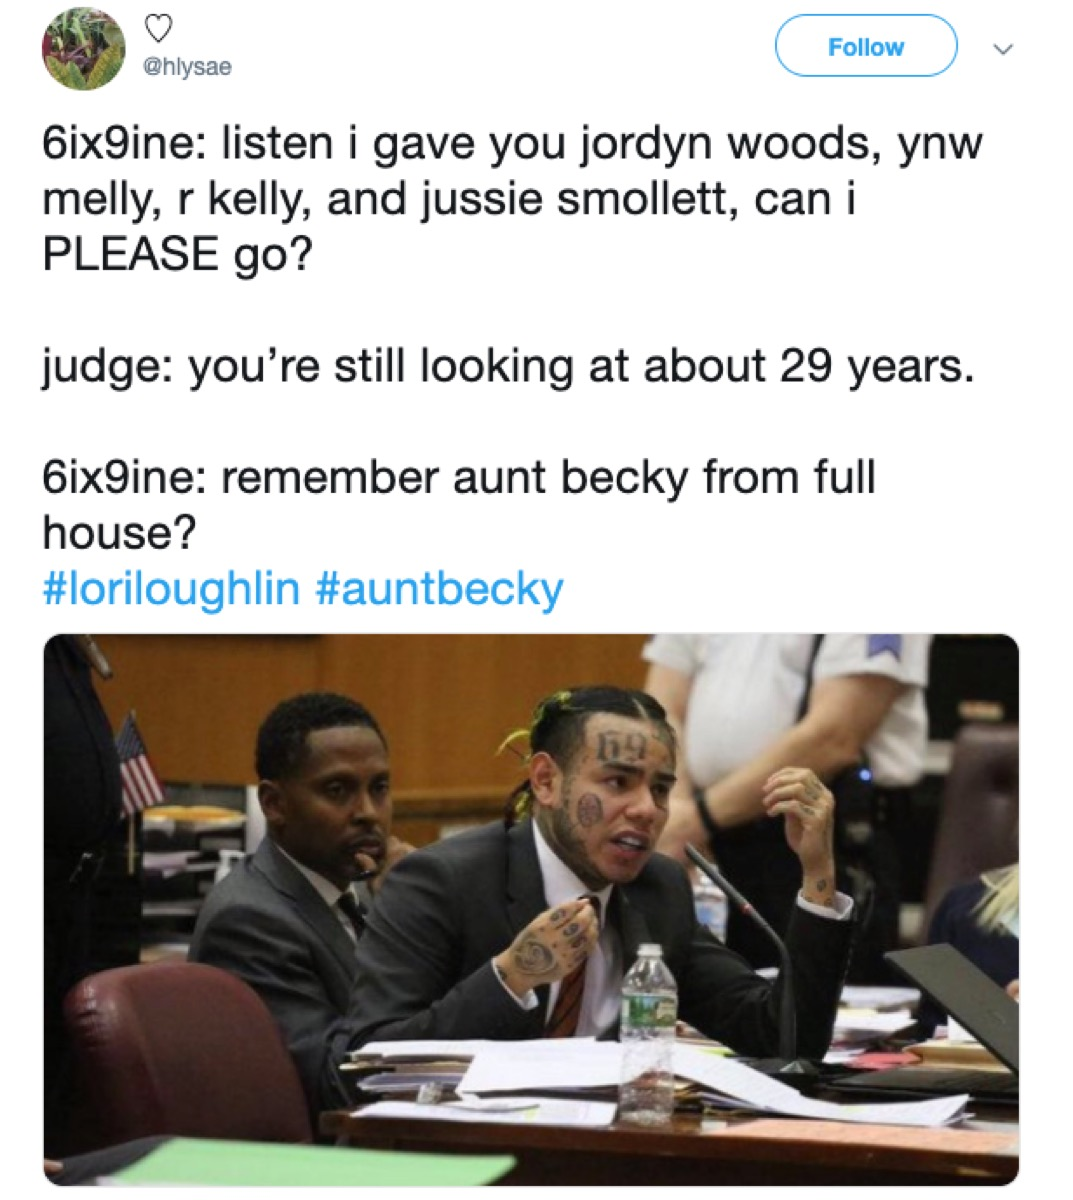 6ix9ine snitching, 2019 memes